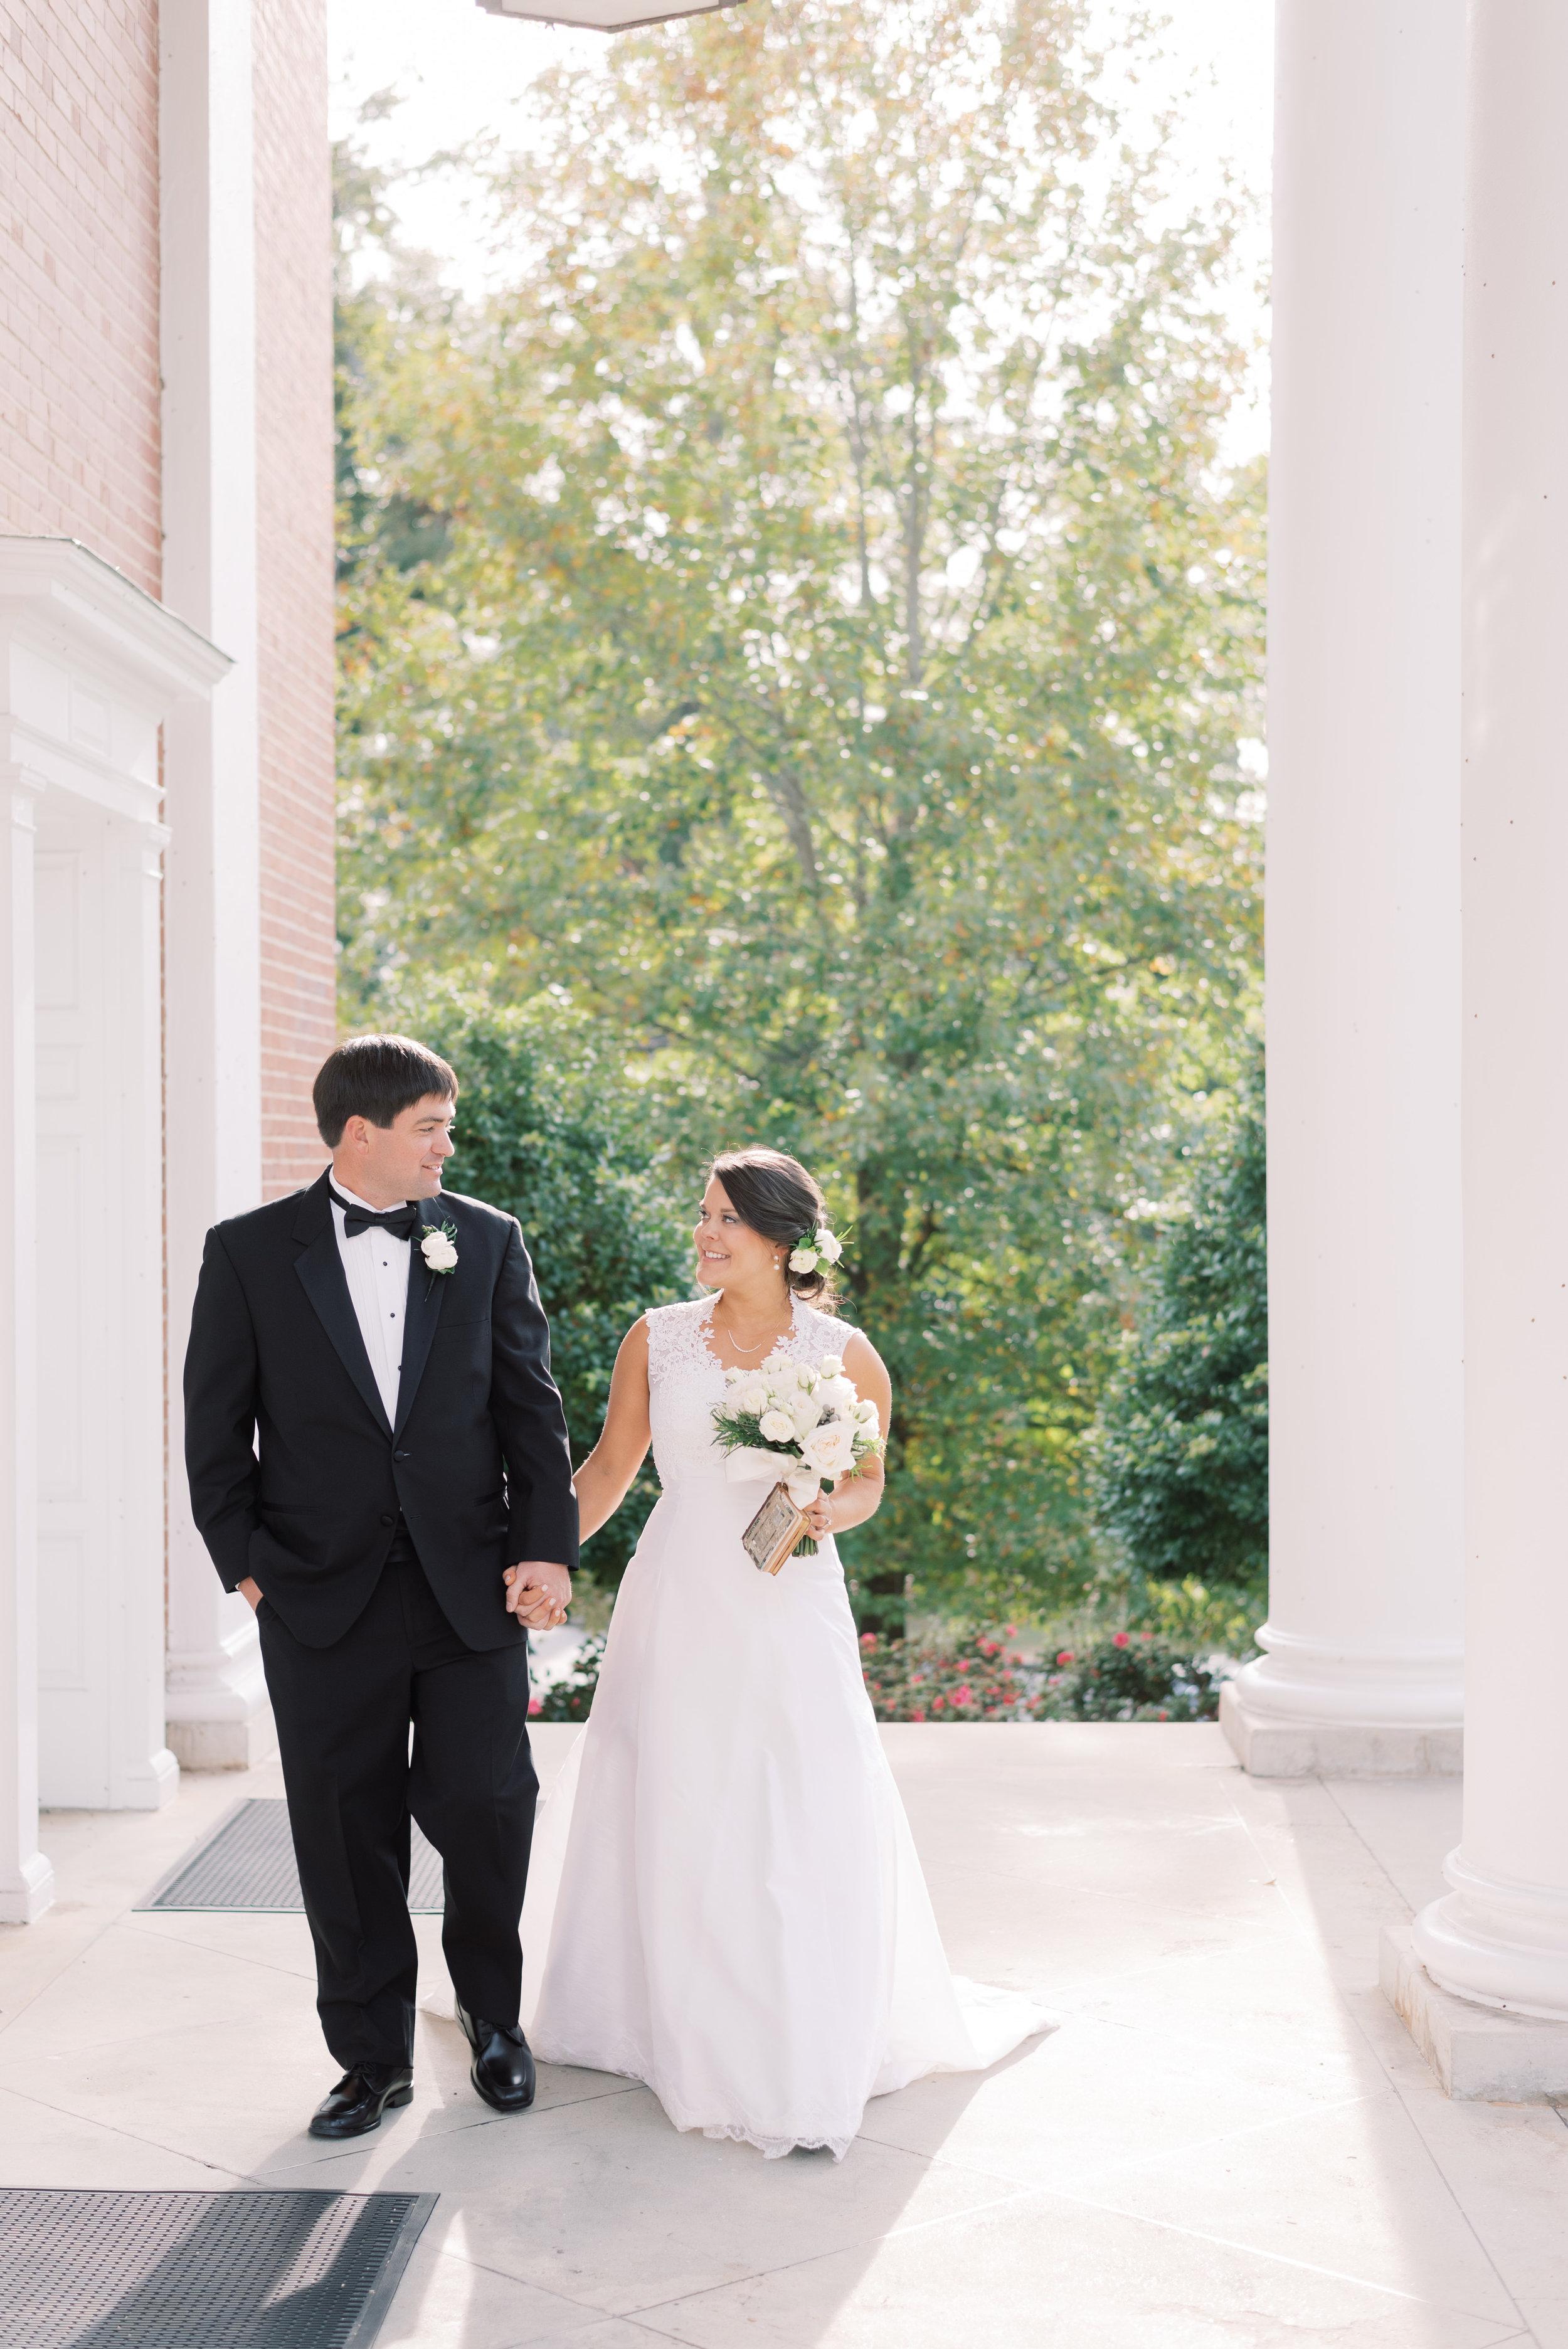 Fober_Wedding_Columbus_Georgia_Green_Island_Country_Club_Fallen_Photography_2b-111.JPG